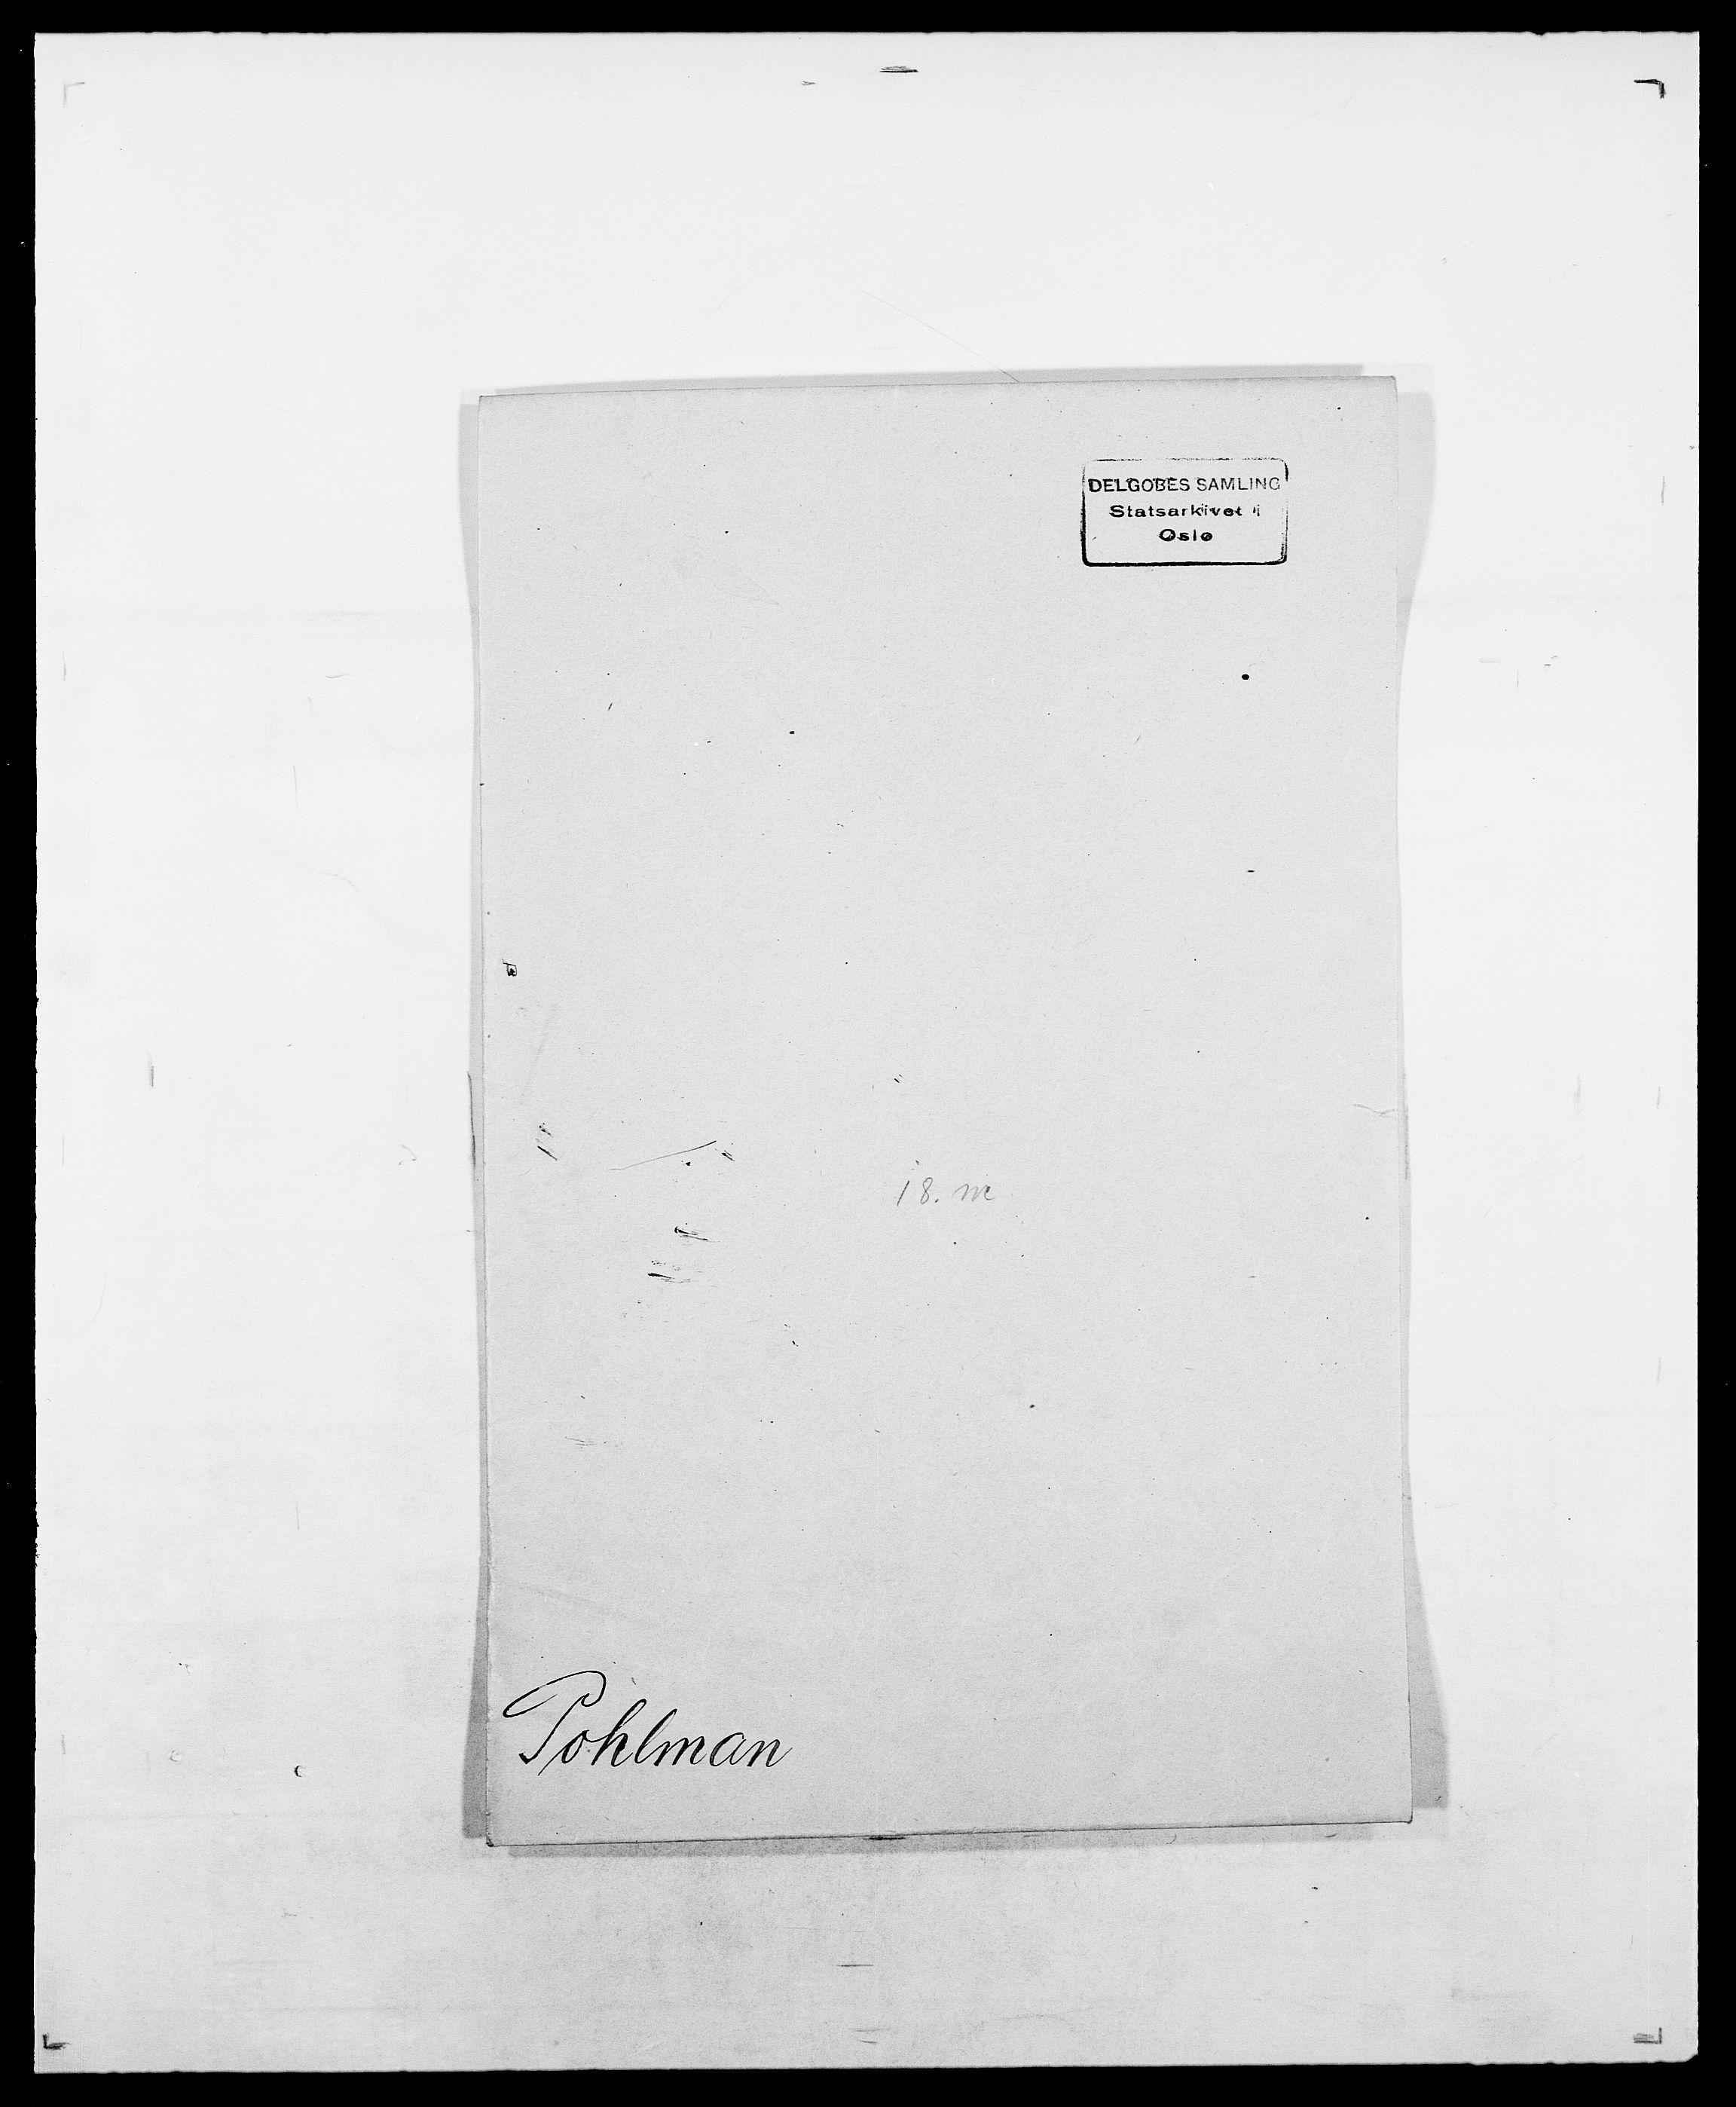 SAO, Delgobe, Charles Antoine - samling, D/Da/L0031: de Place - Raaum, s. 169